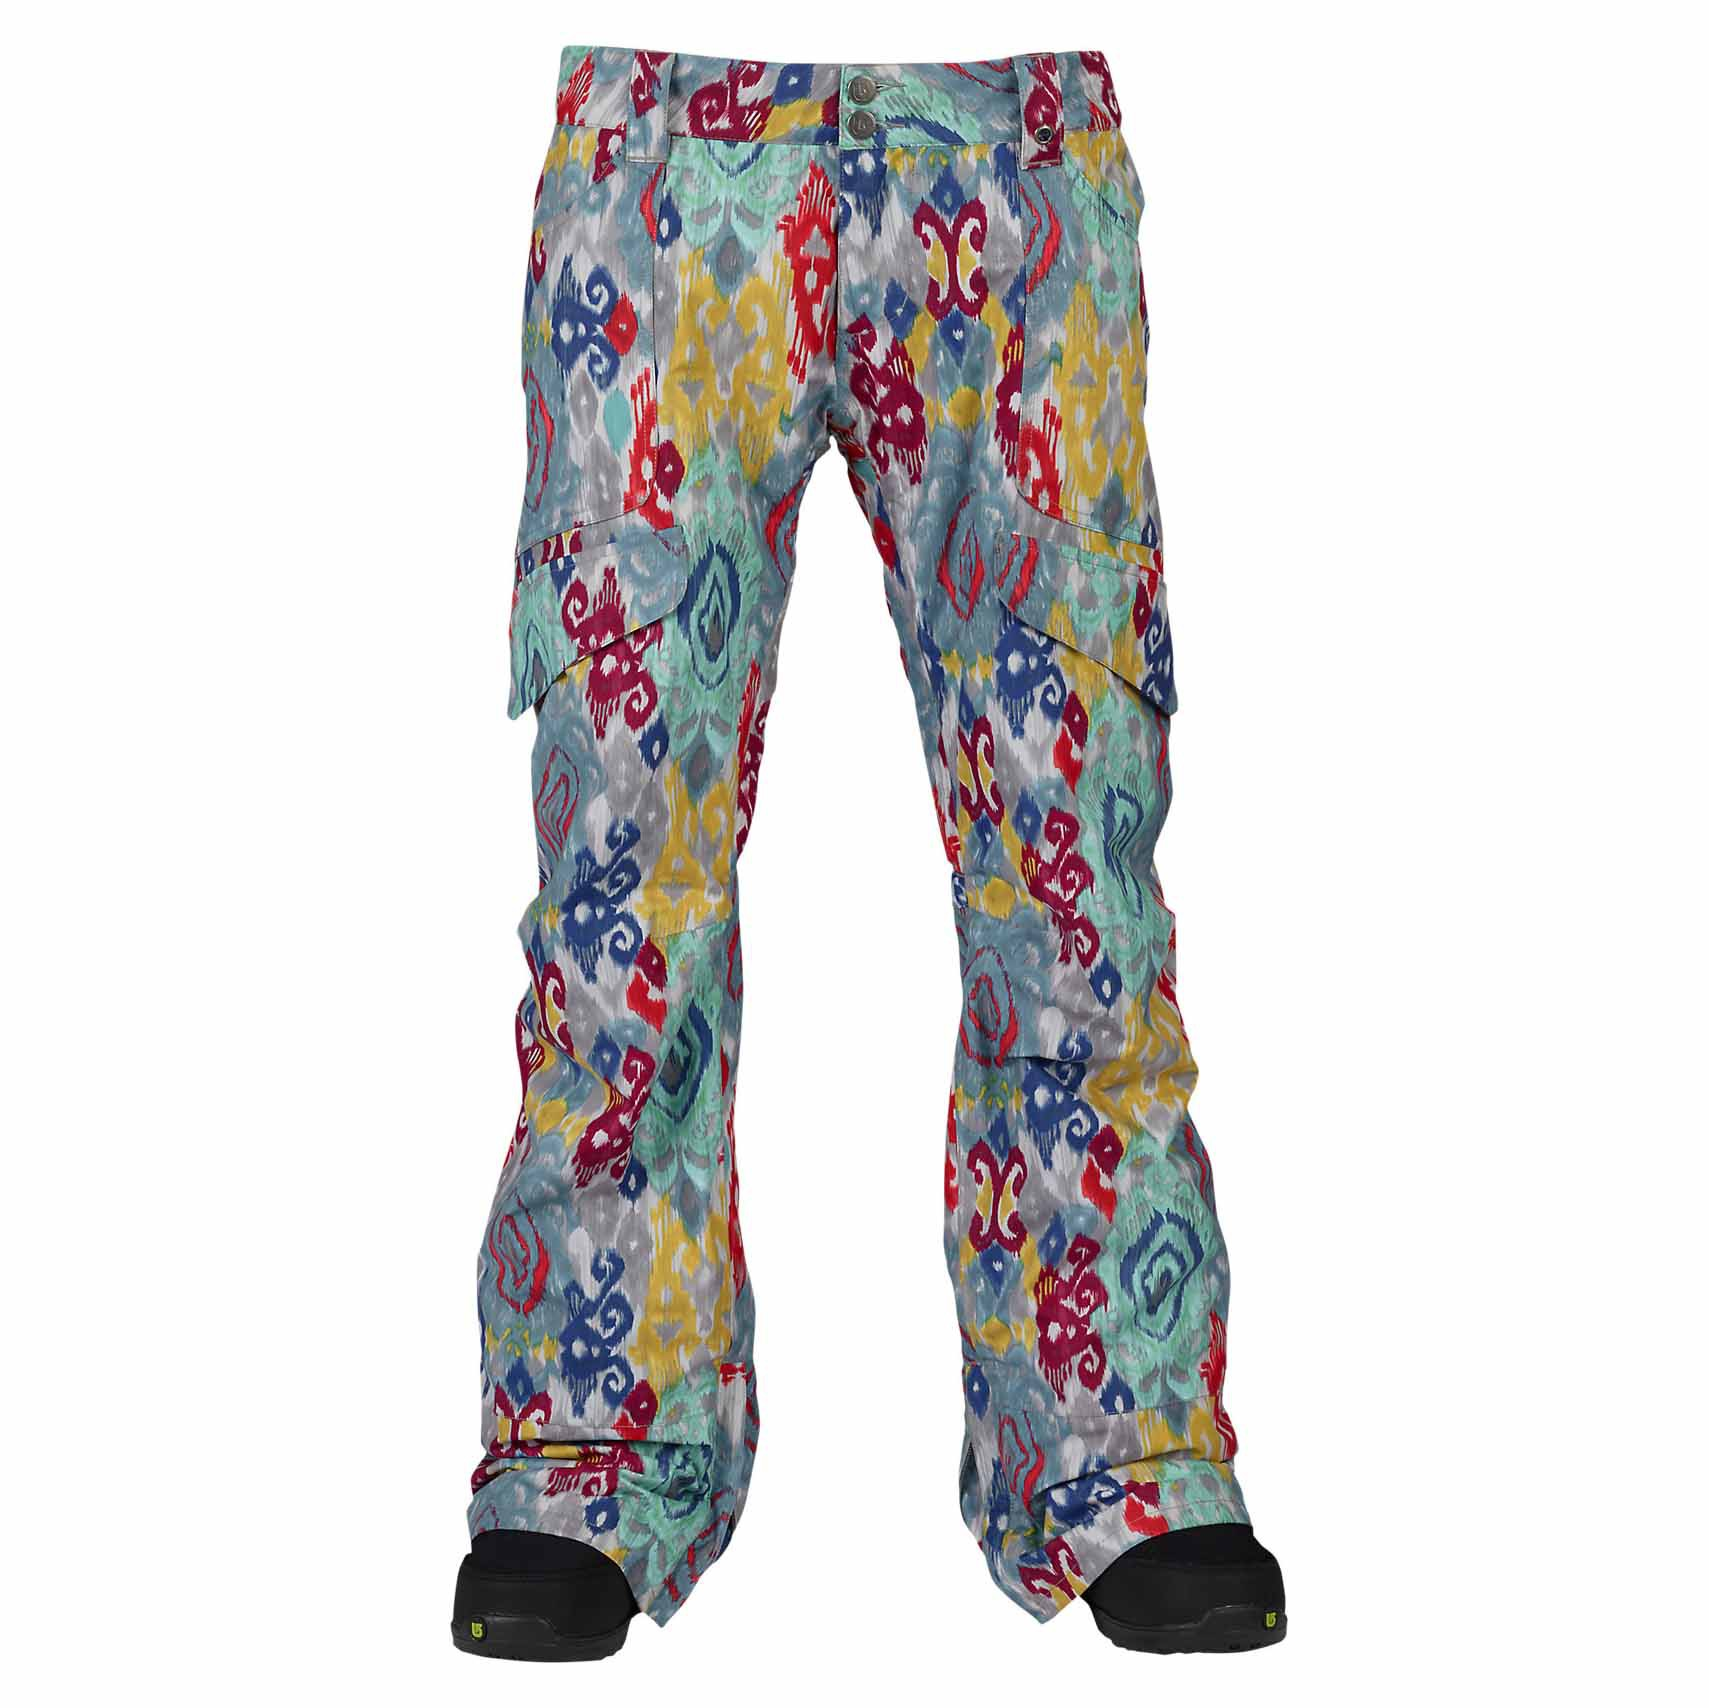 Kalhoty Burton Lucky kasbah